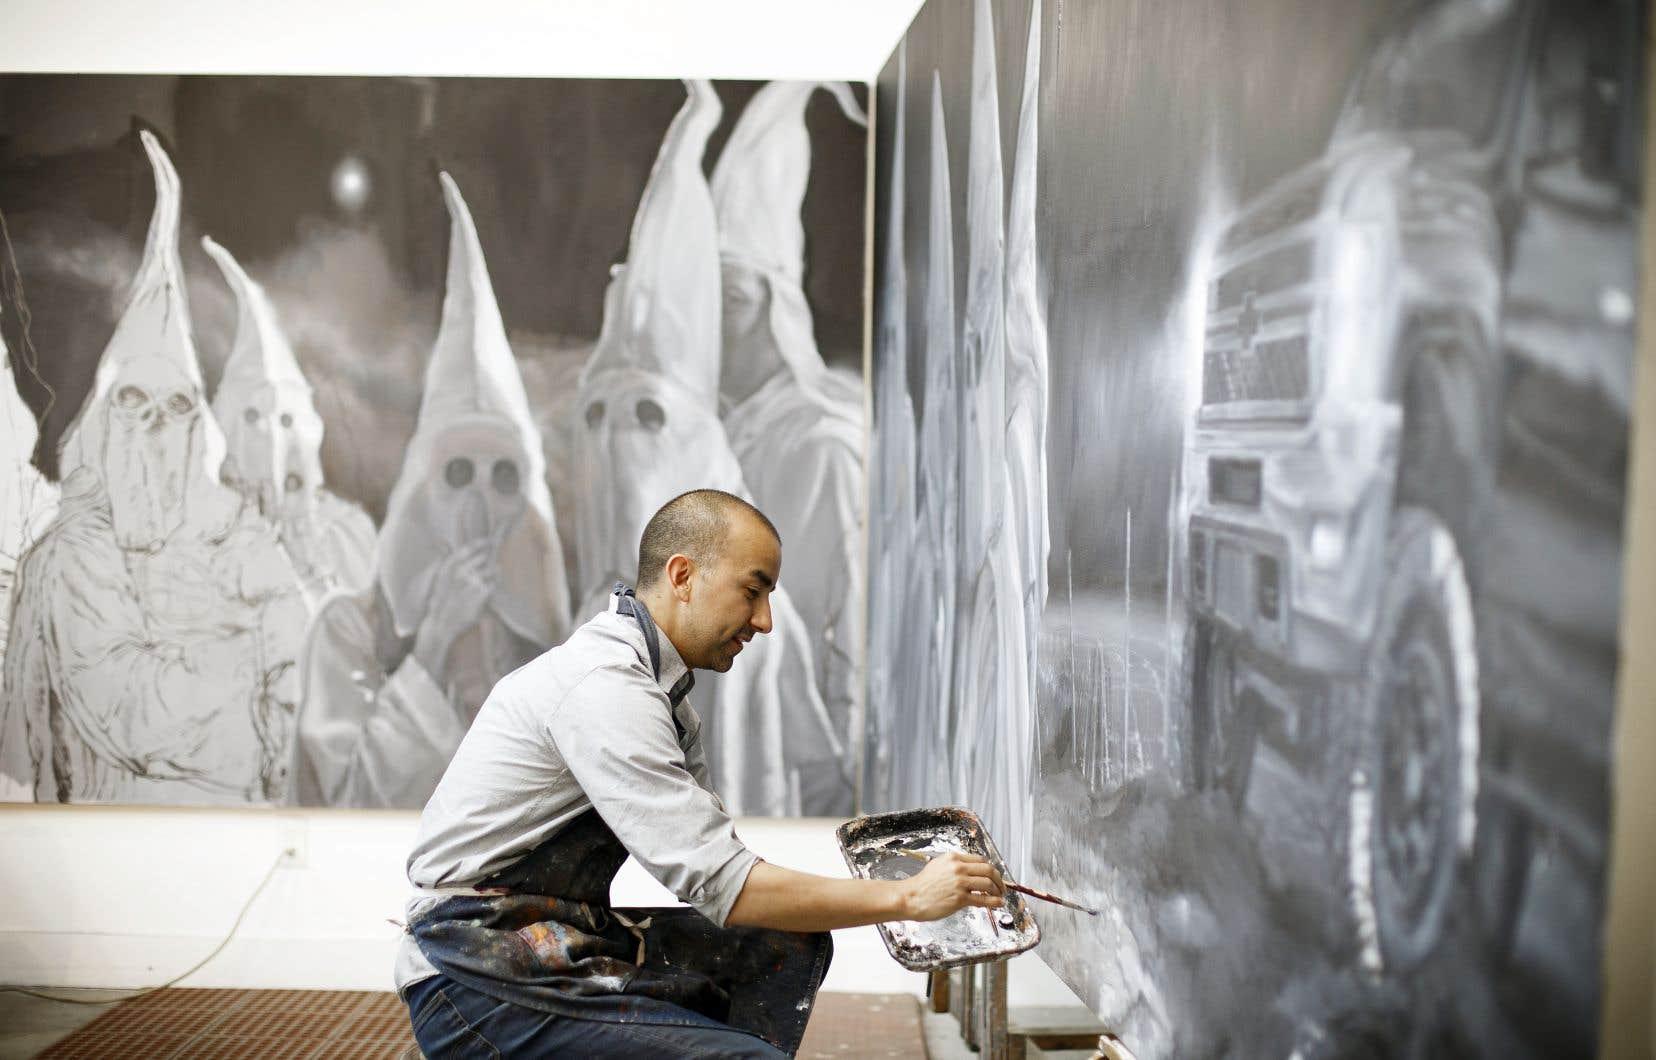 L'artiste Vincent Valdez dans son studio, en 2016